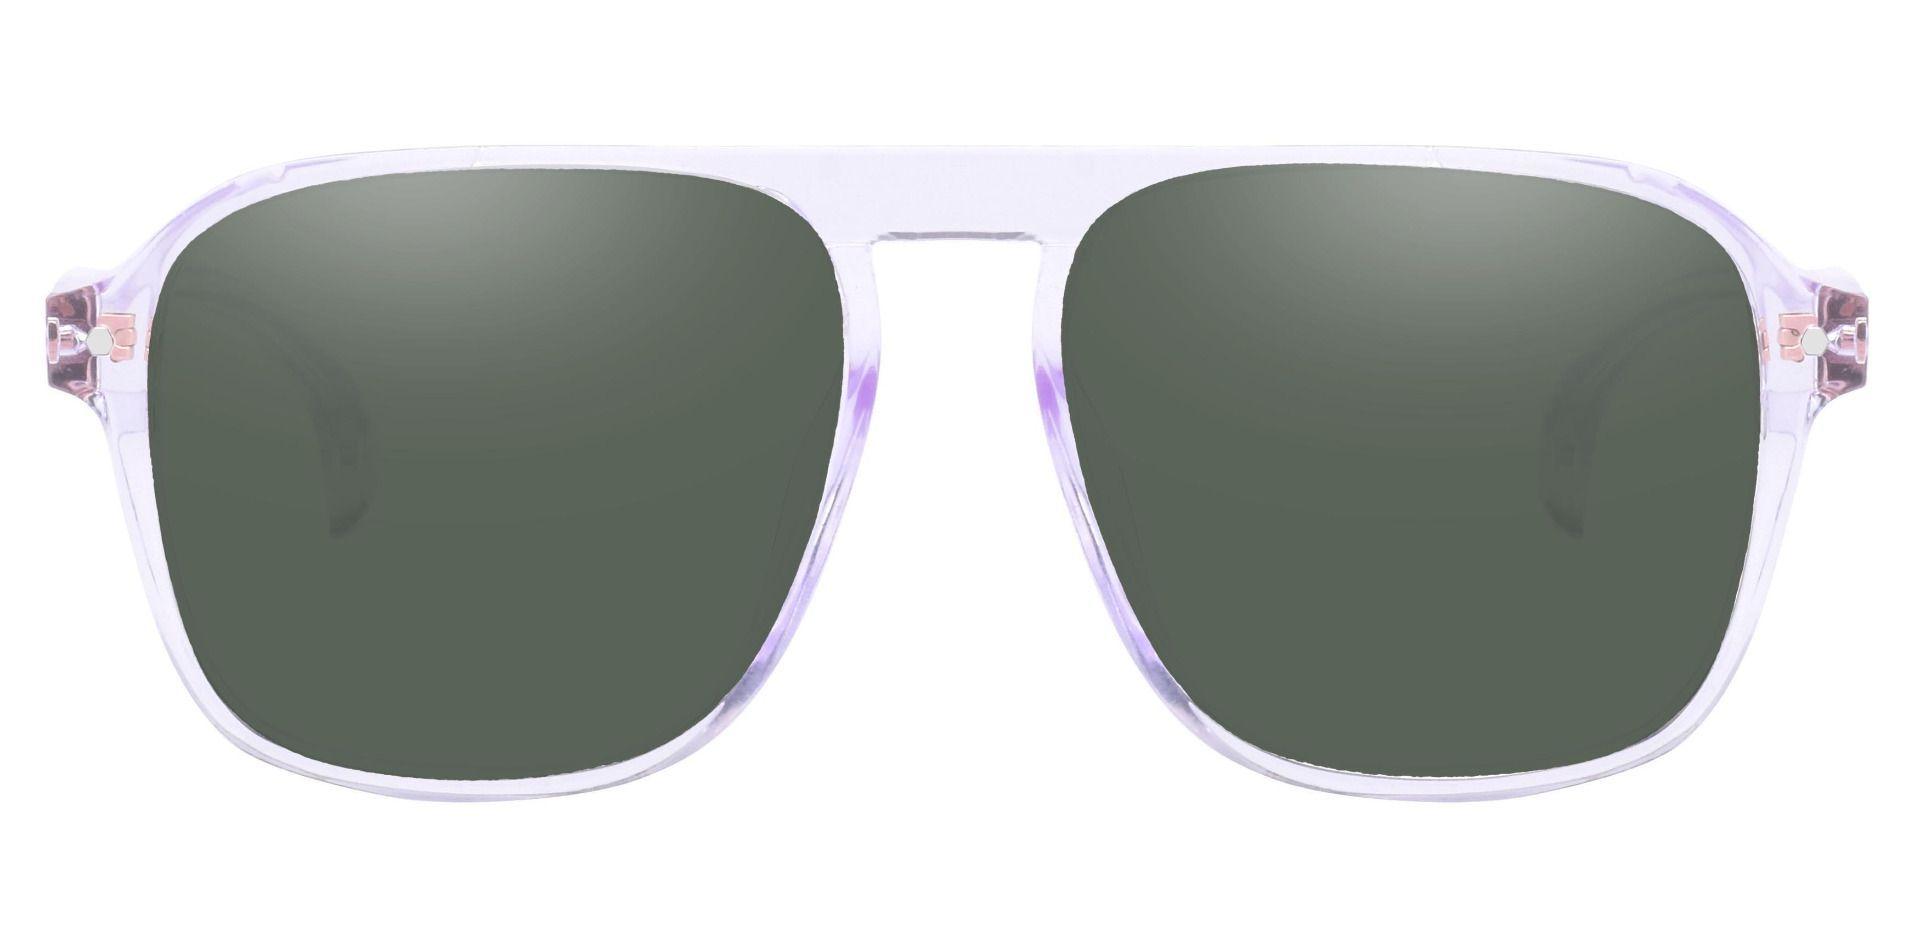 Gideon Aviator Prescription Sunglasses - Clear Frame With Green Lenses